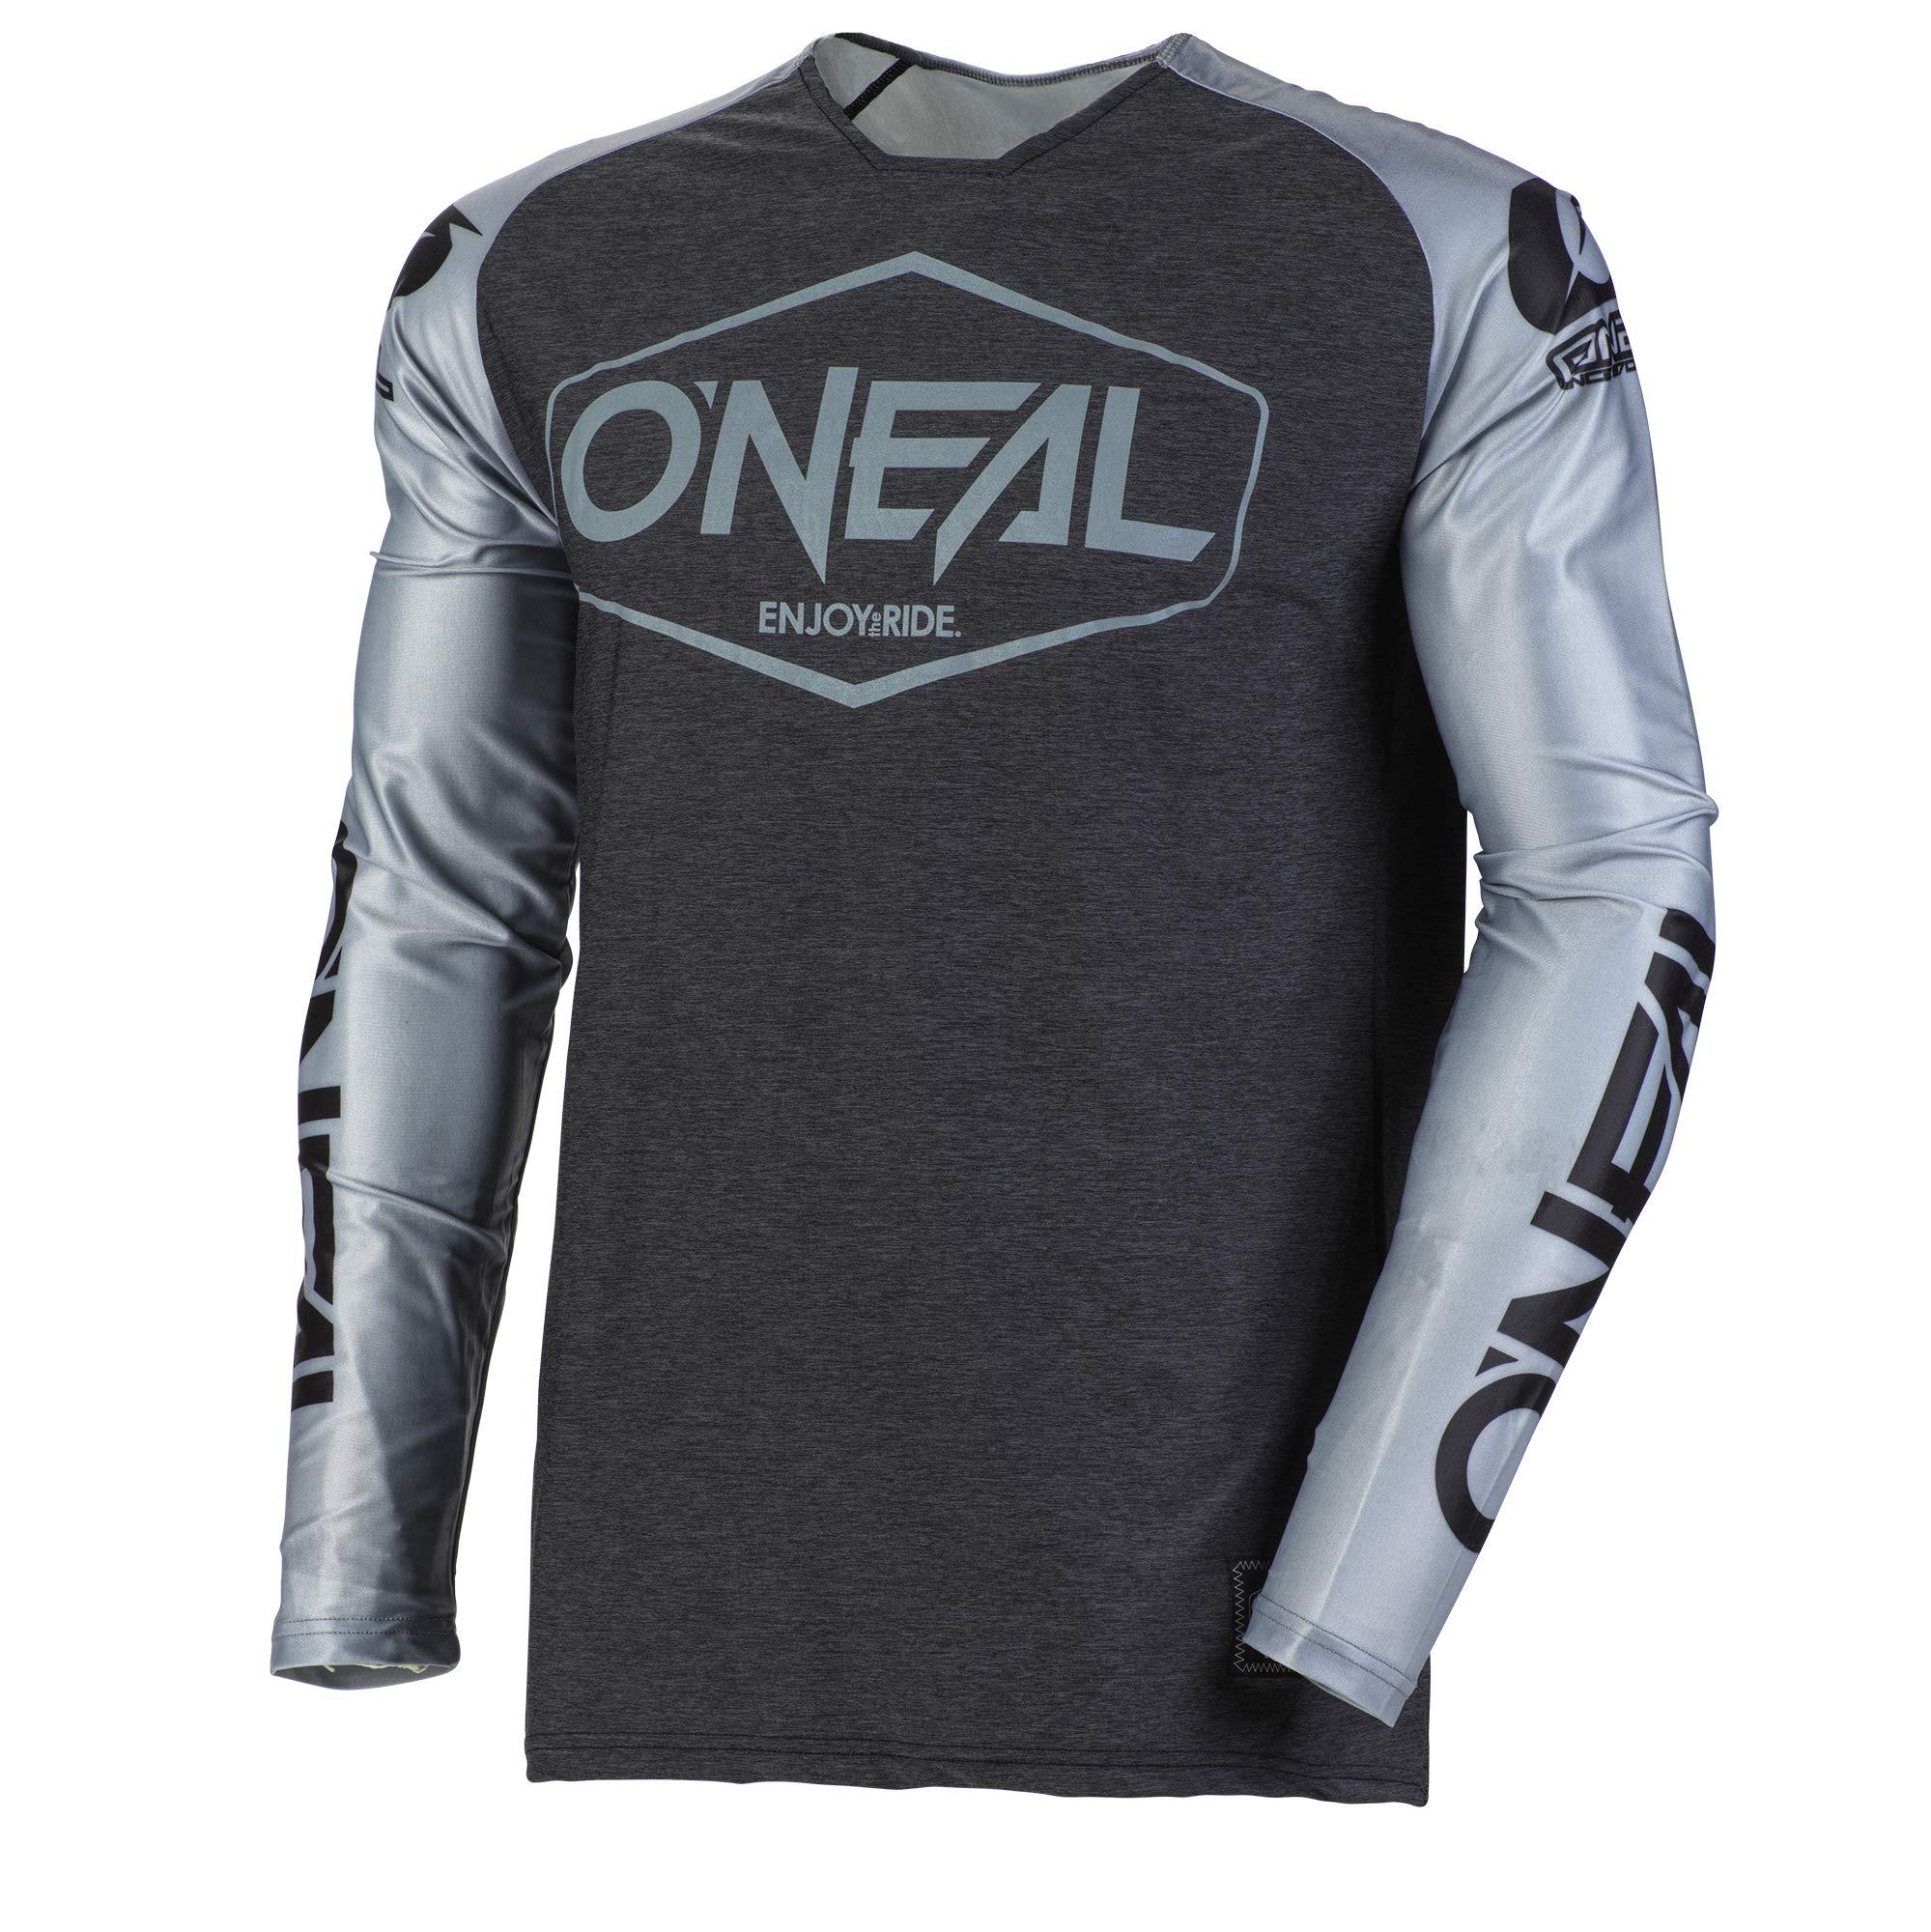 O'Neal Mayhem Hexx Adult Jersey (Gray/Black, XL) by O'Neal